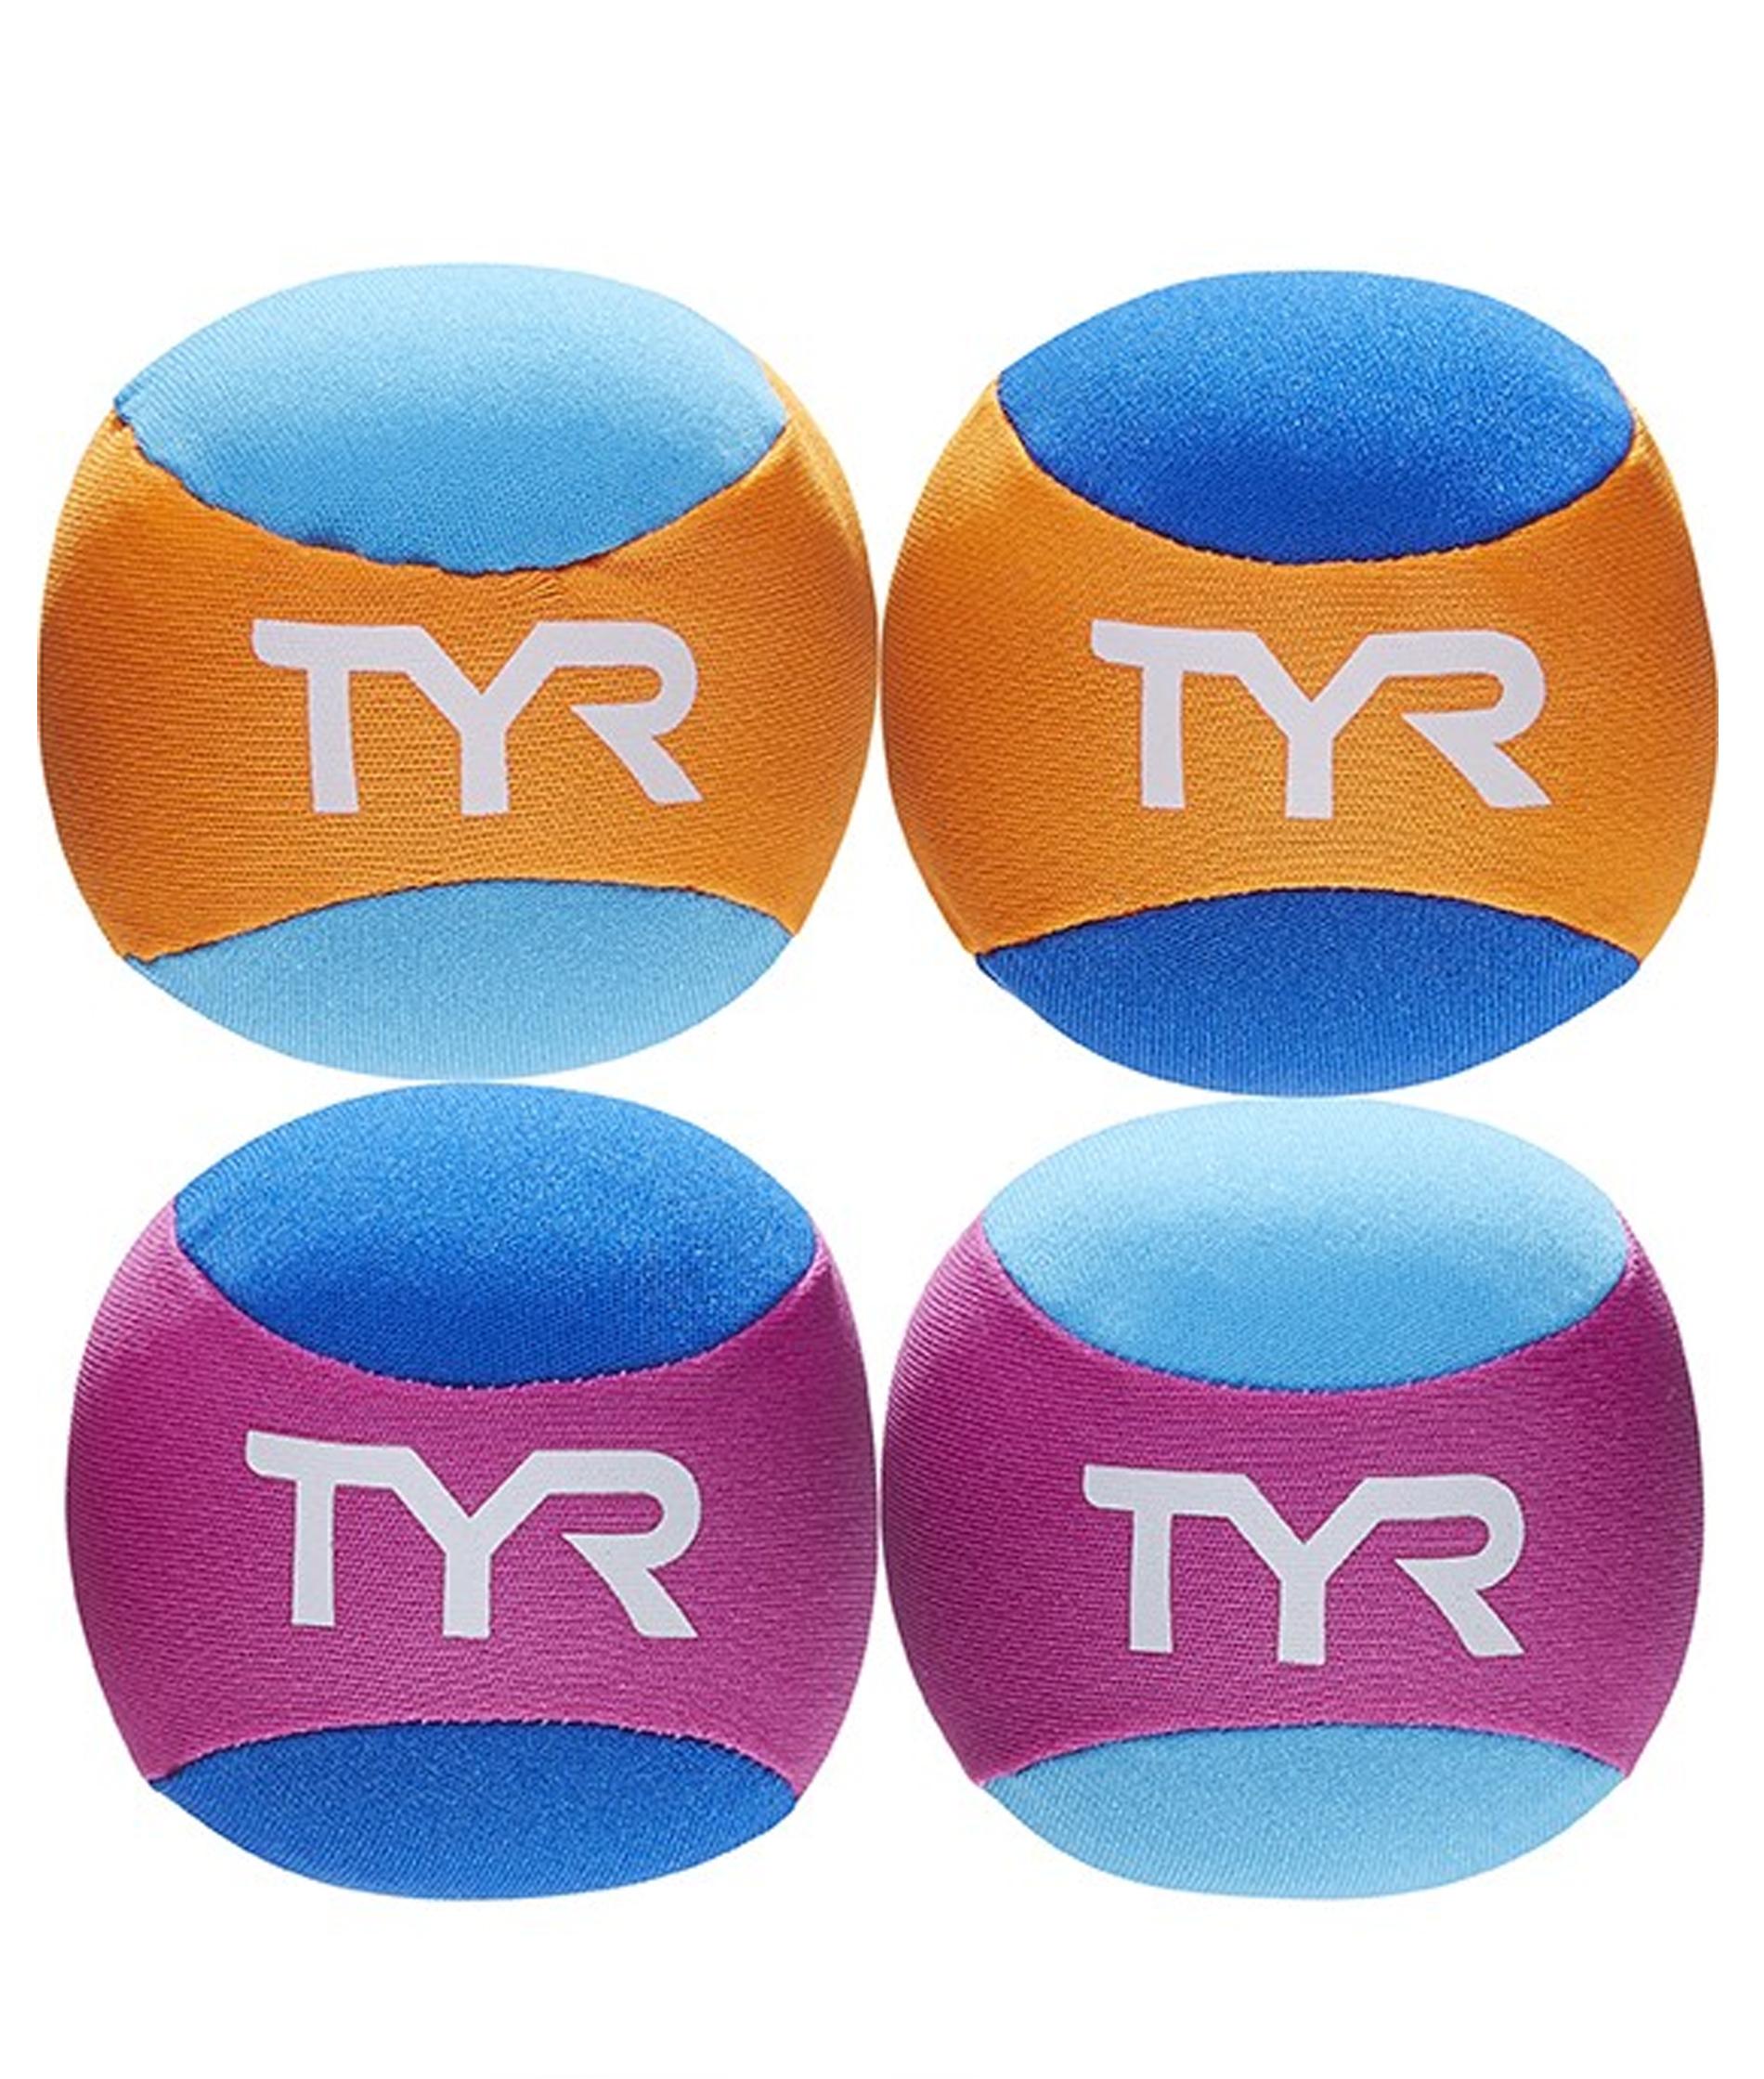 TYR Kids' Start to Swim Pool Balls